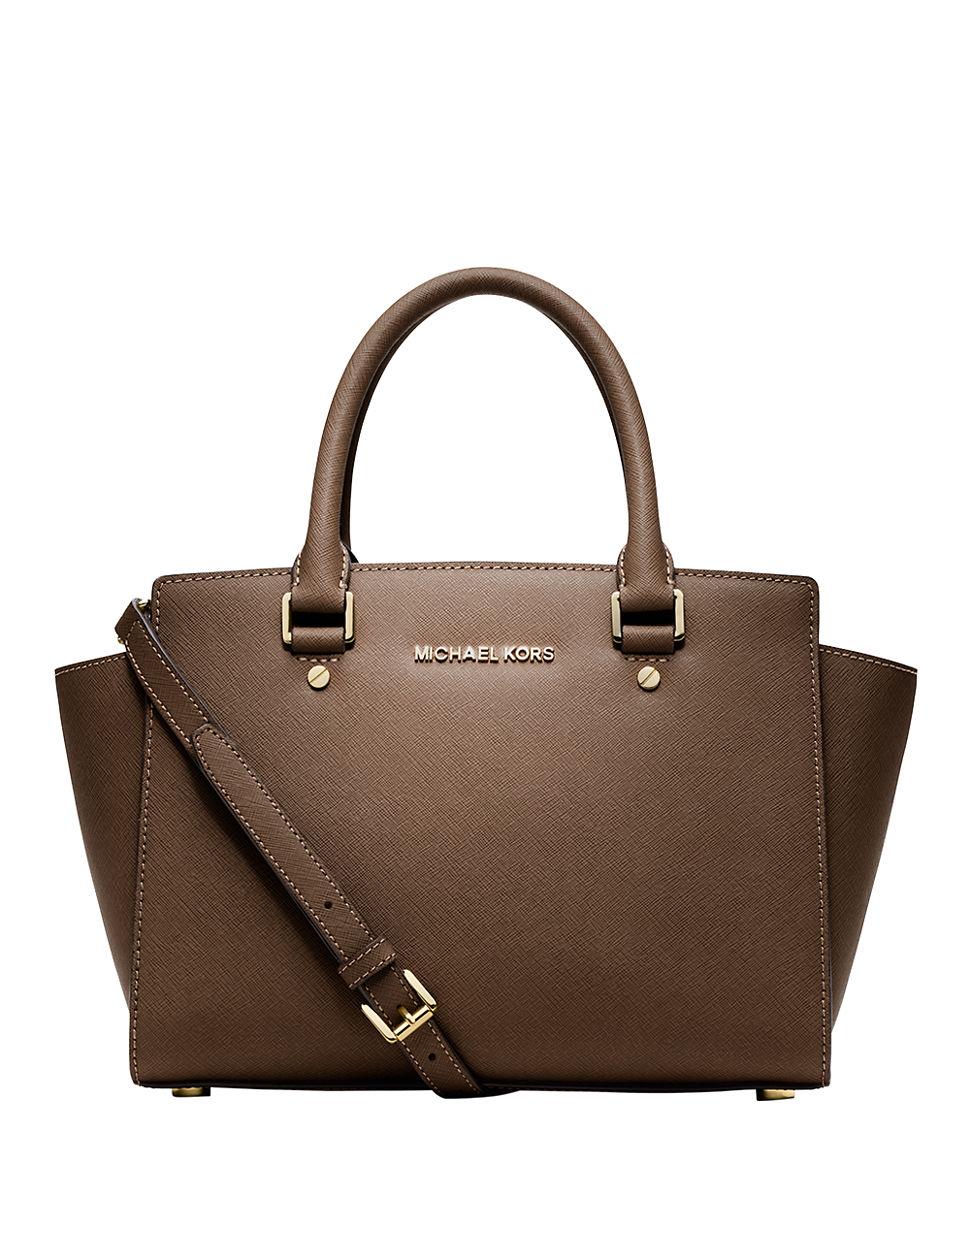 michael michael kors selma leather medium zip satchel in brown dark dune lyst. Black Bedroom Furniture Sets. Home Design Ideas